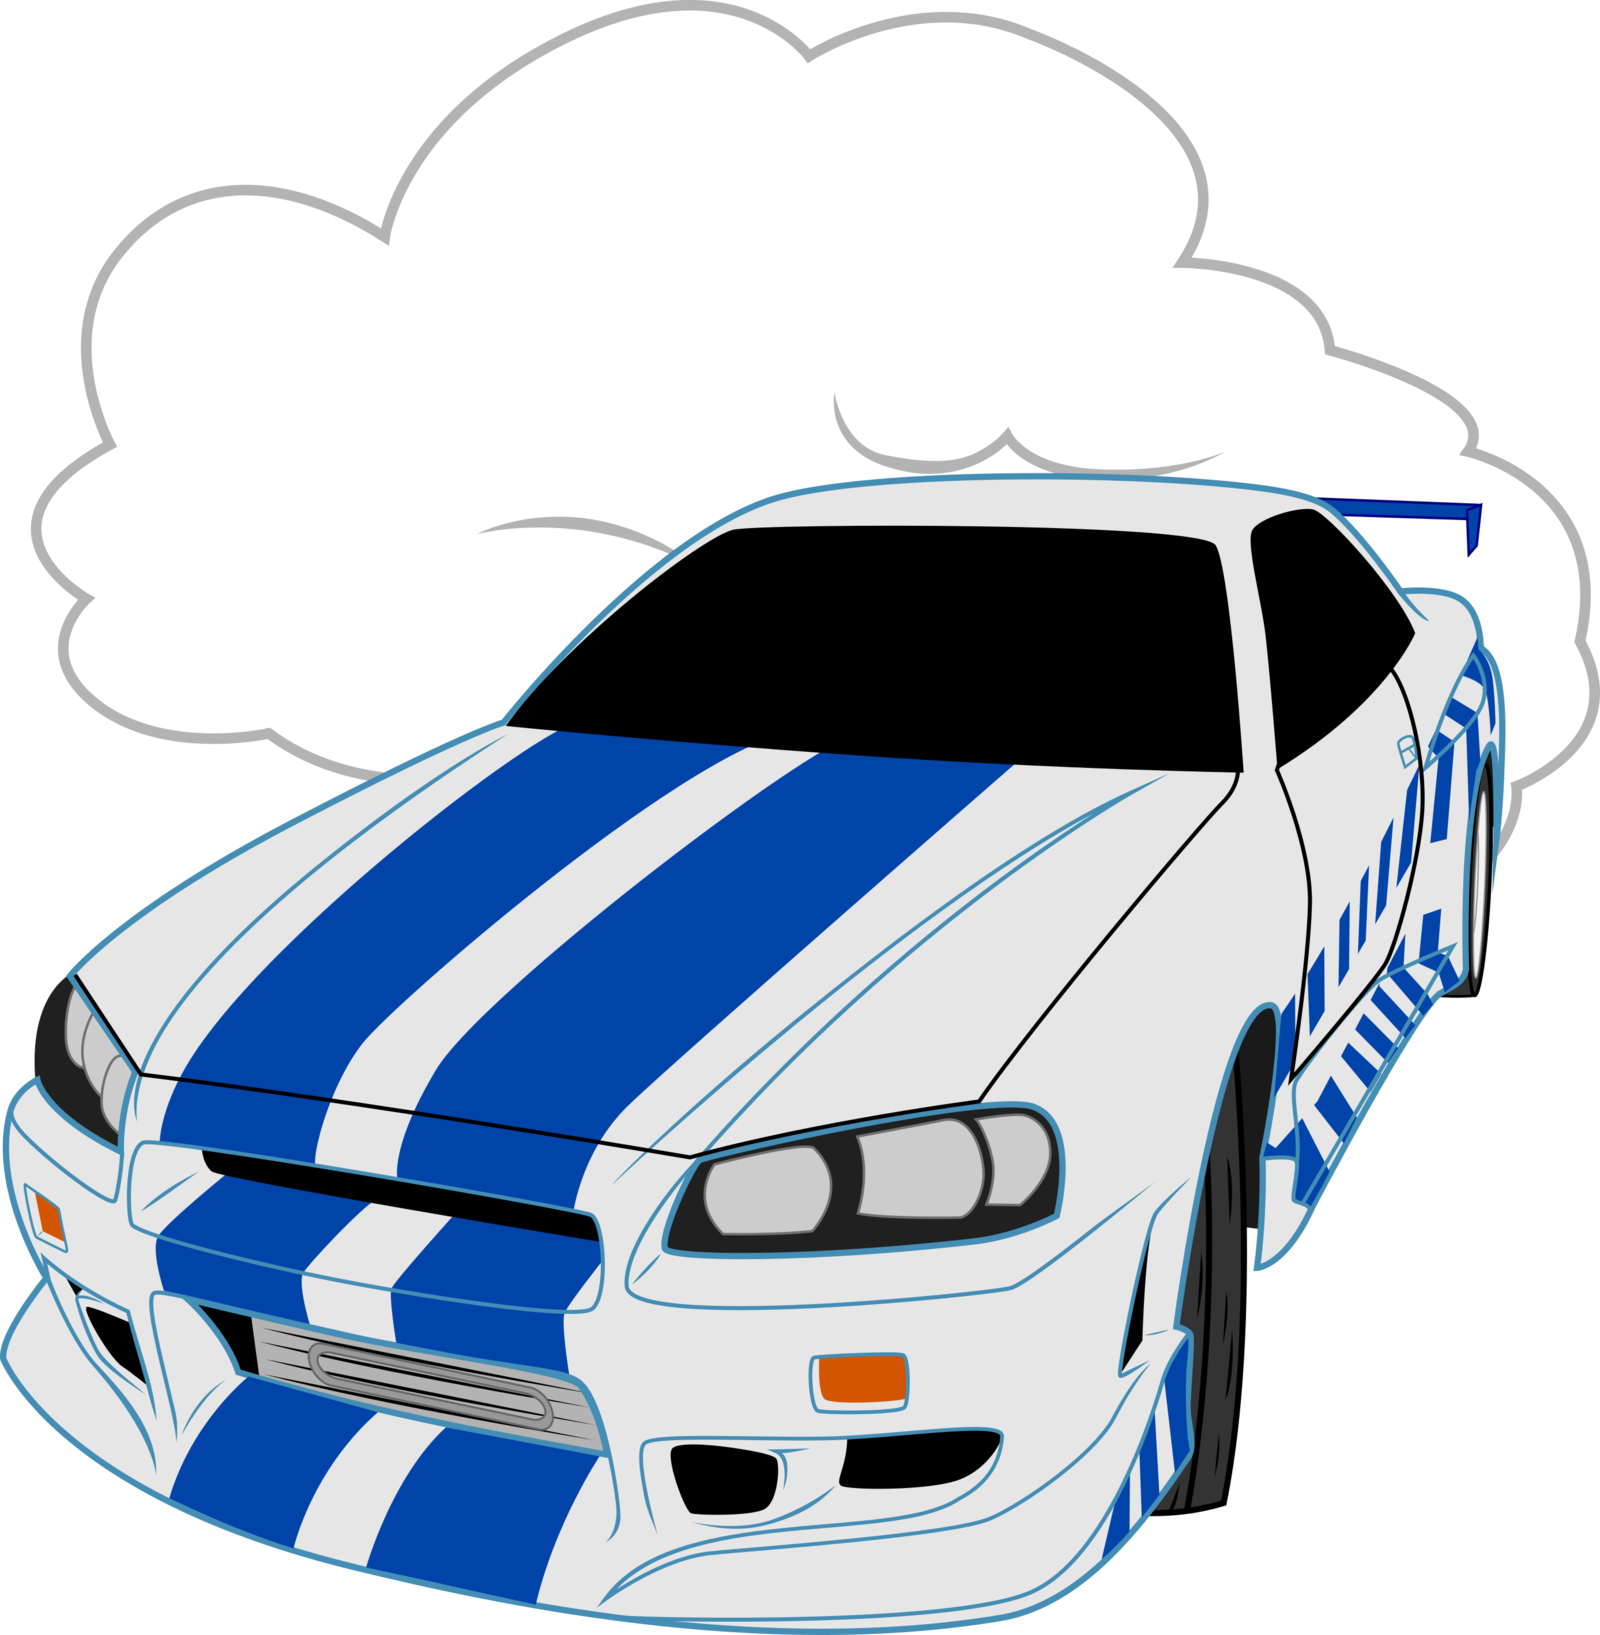 Clipart car skyline. Nissan gt r png